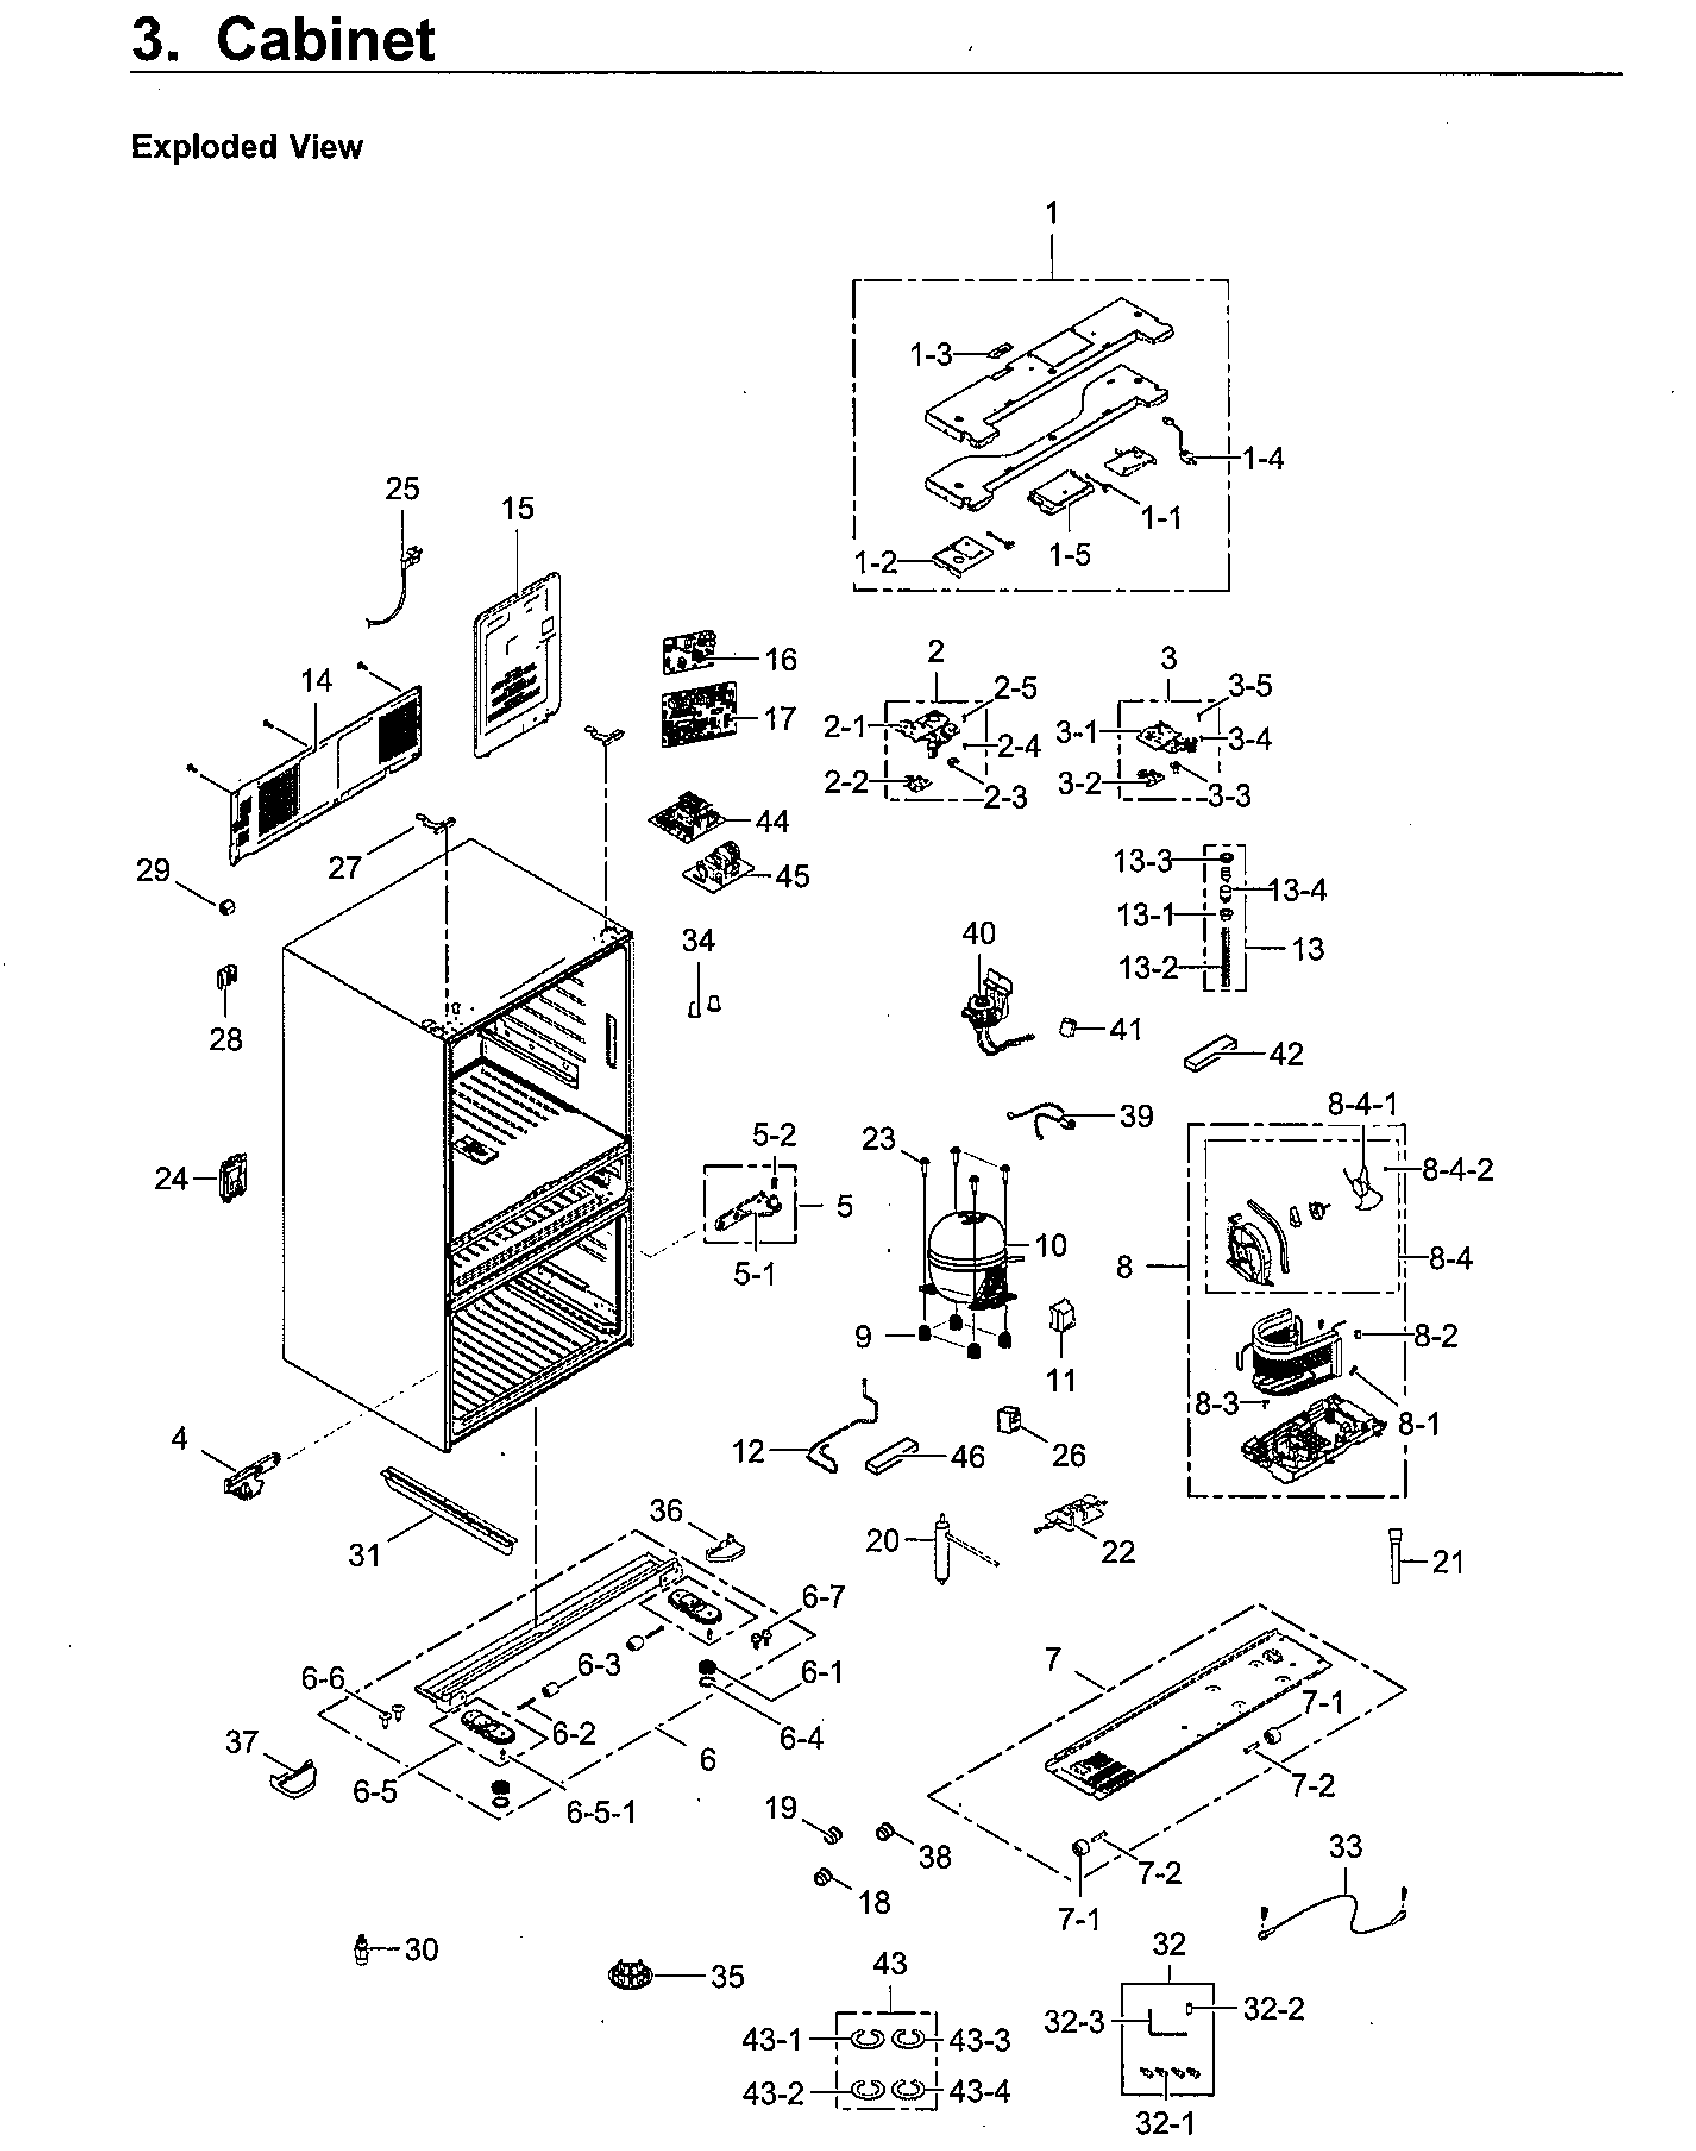 Samsung model RF23M8090SG/AA-00 bottom-mount refrigerator